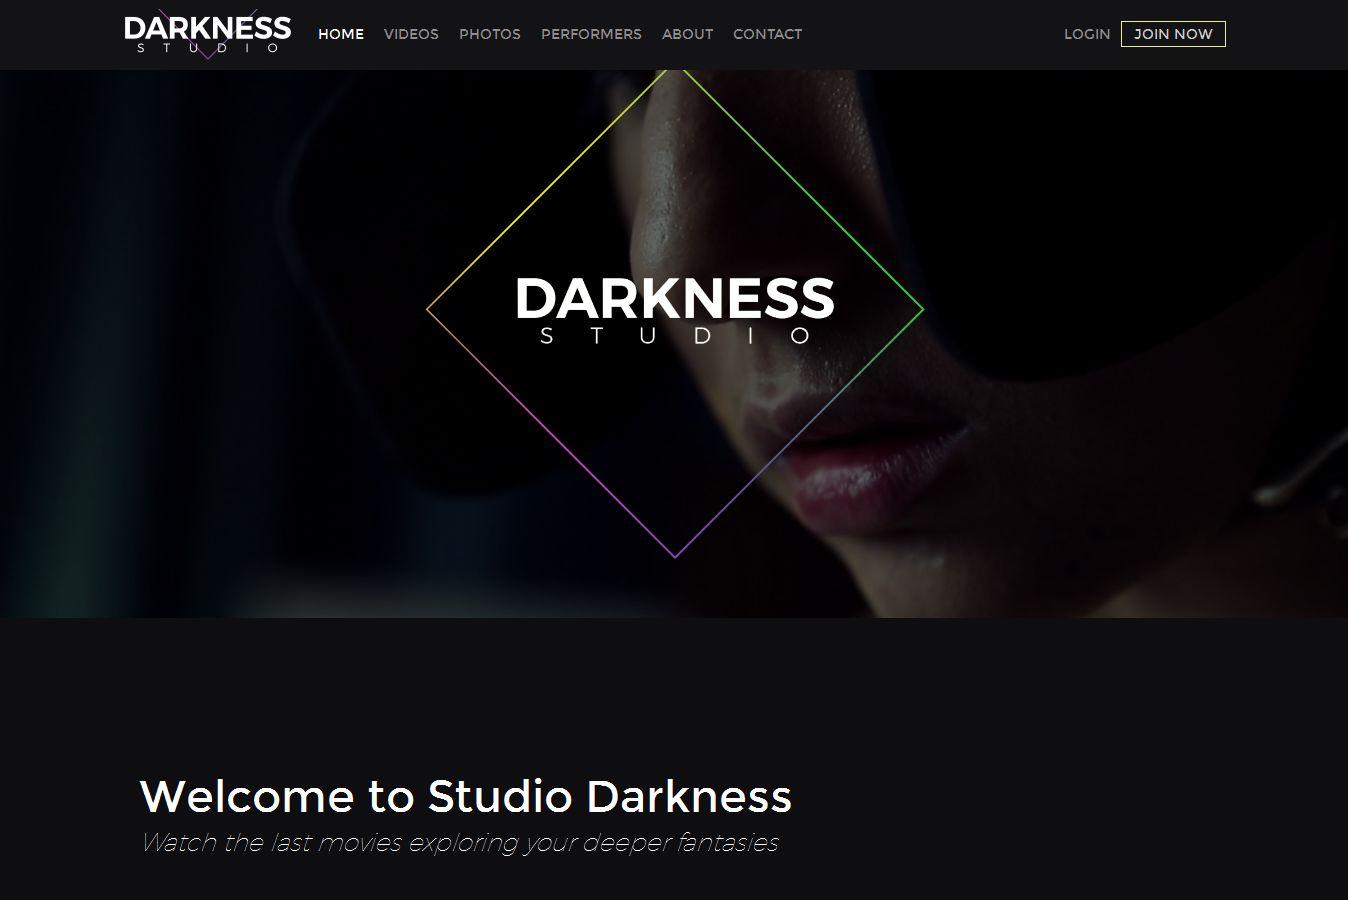 Studio Darkness